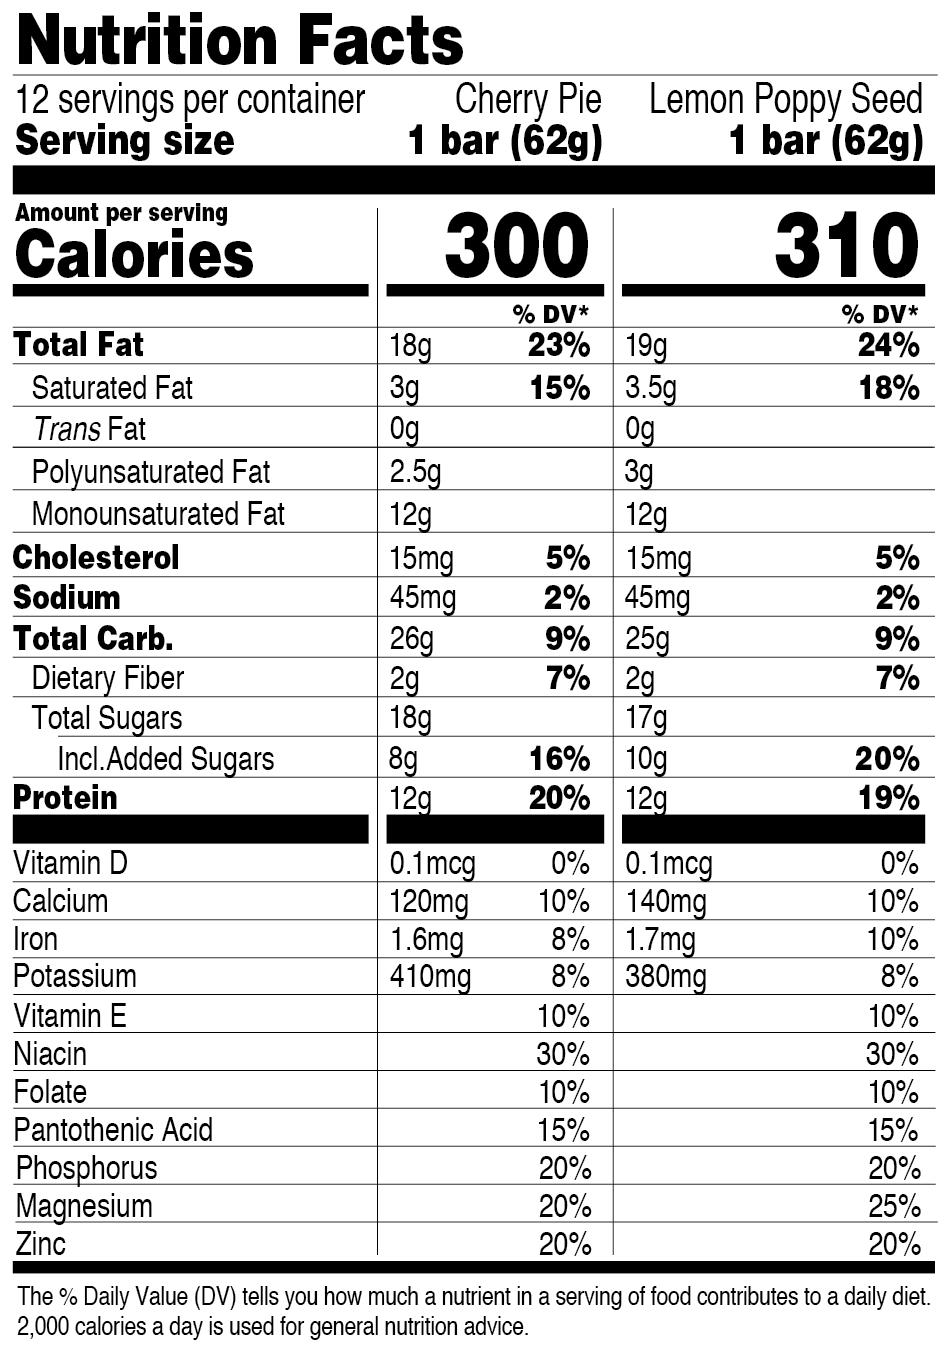 Summer Variety Pack nutritional information